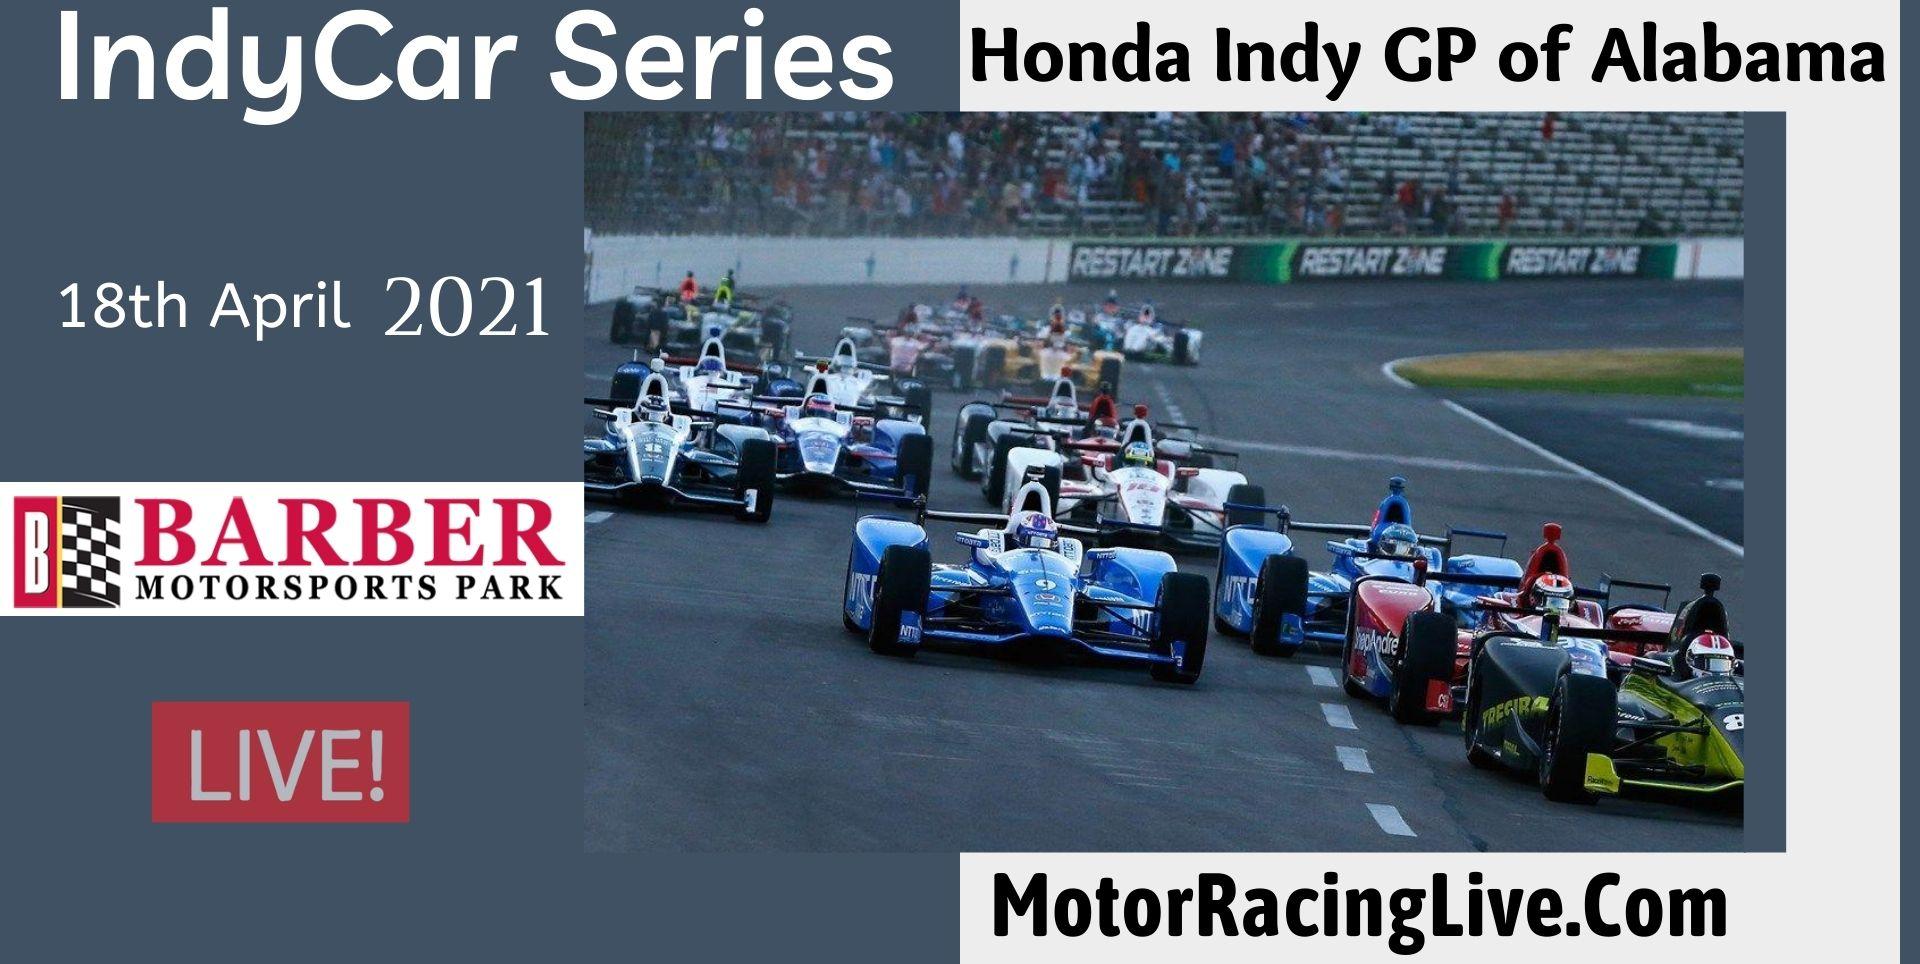 Honda Indy GP Of Alabama Live Stream 2021 | Indycar